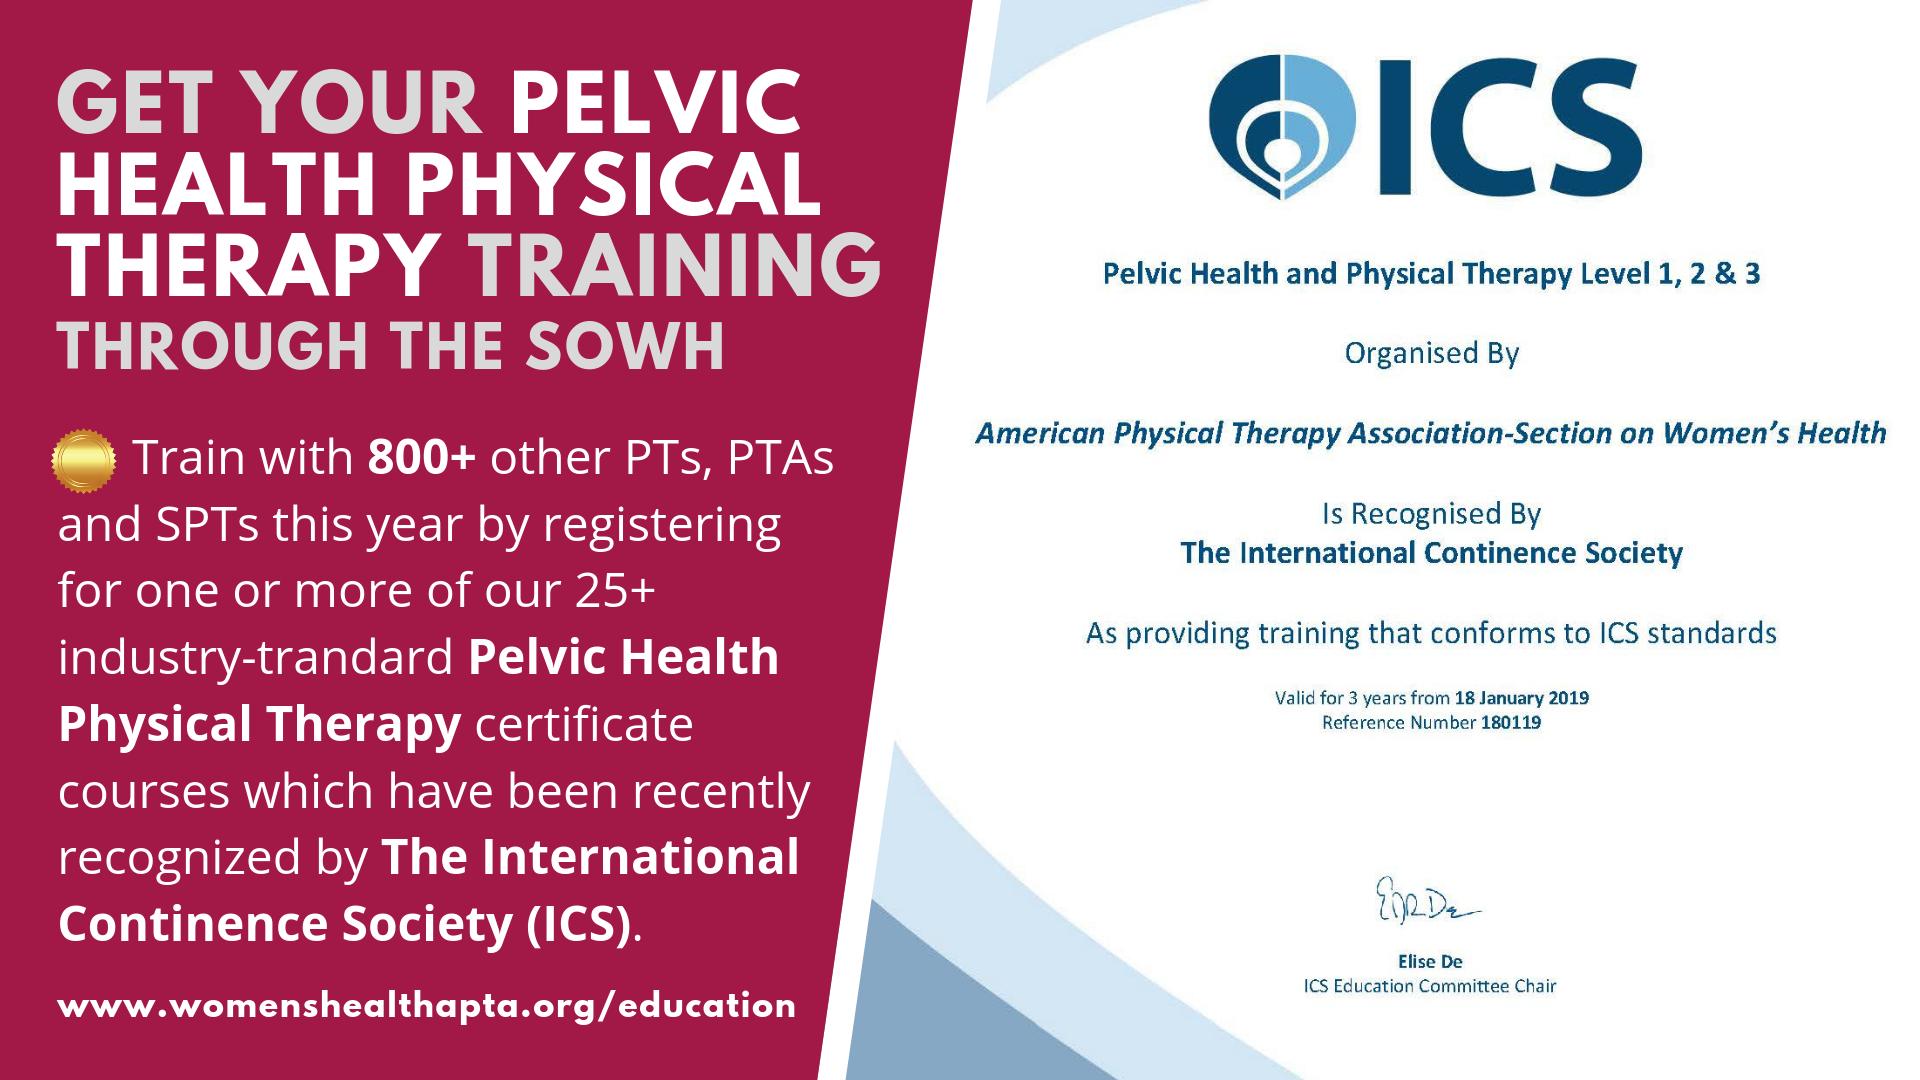 PH1, PH2, PH3 recognized by ICS